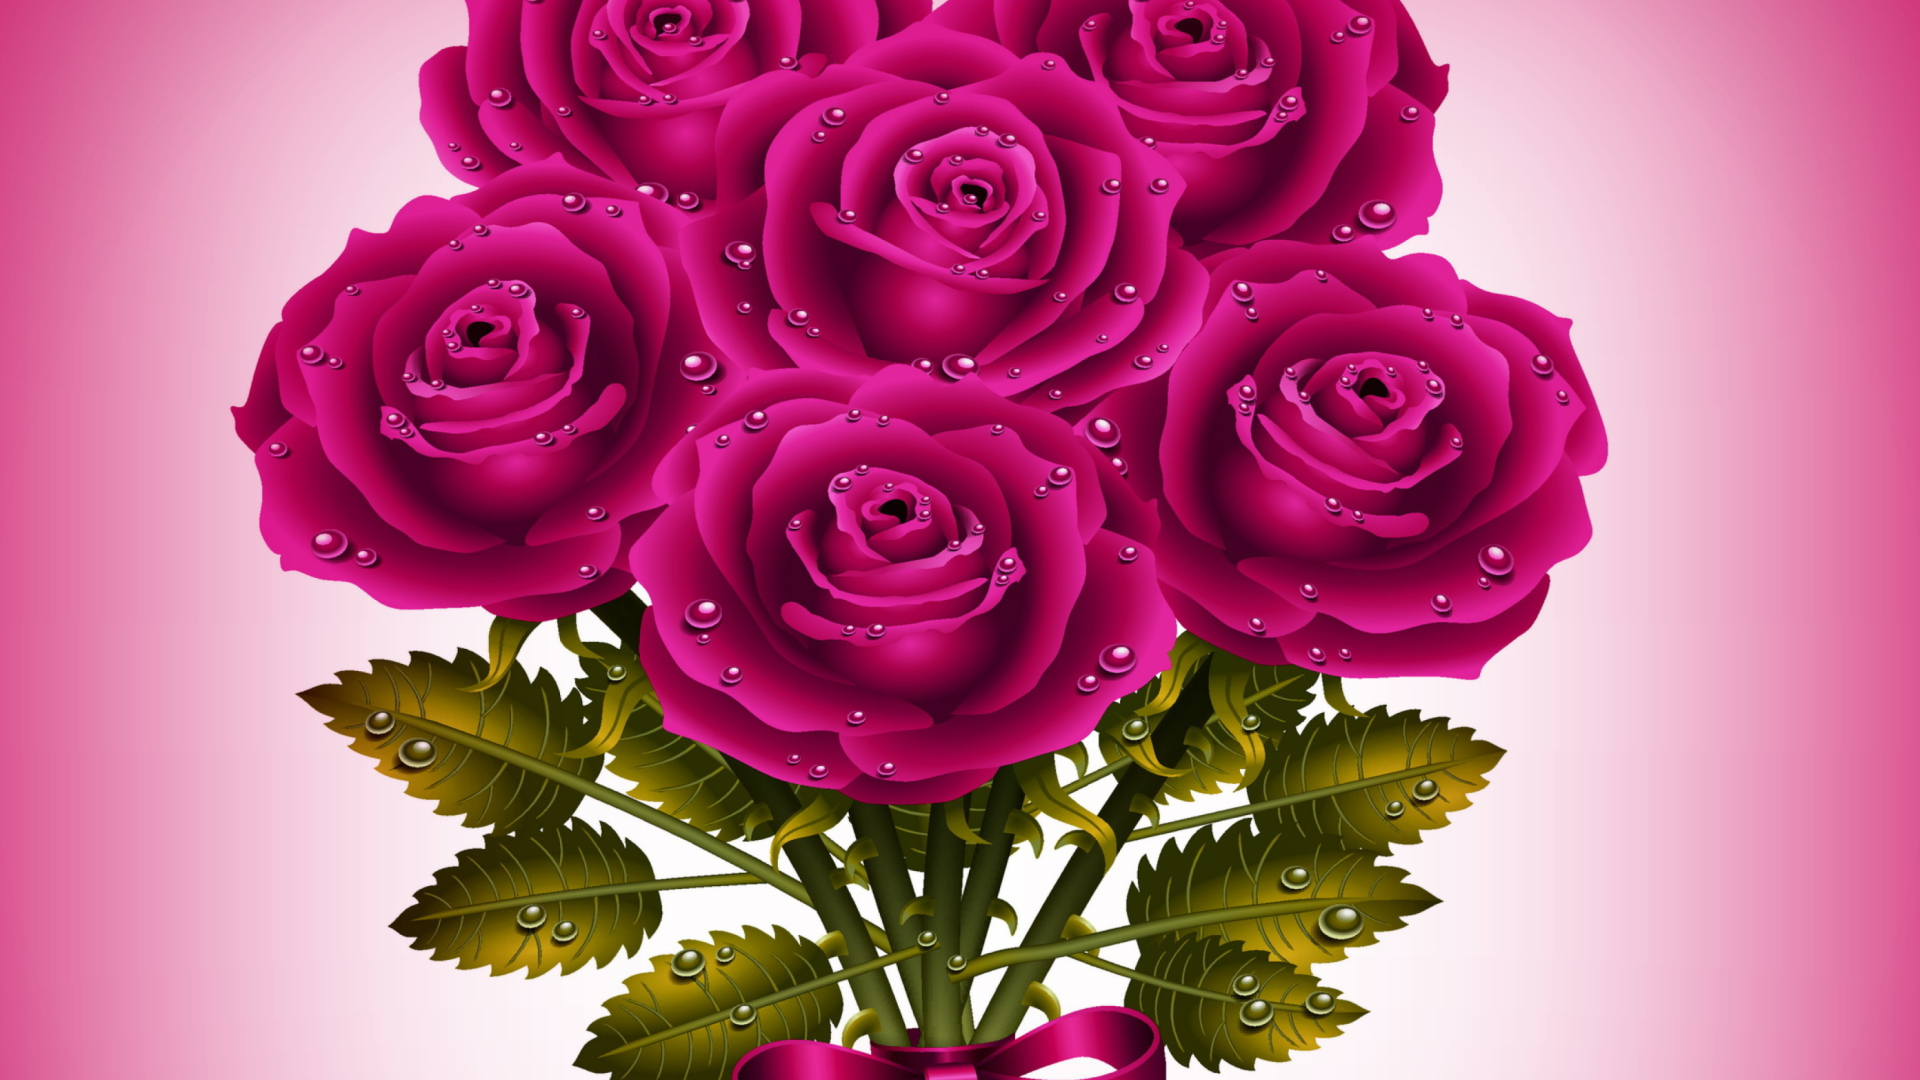 картинки на три экрана розы видел